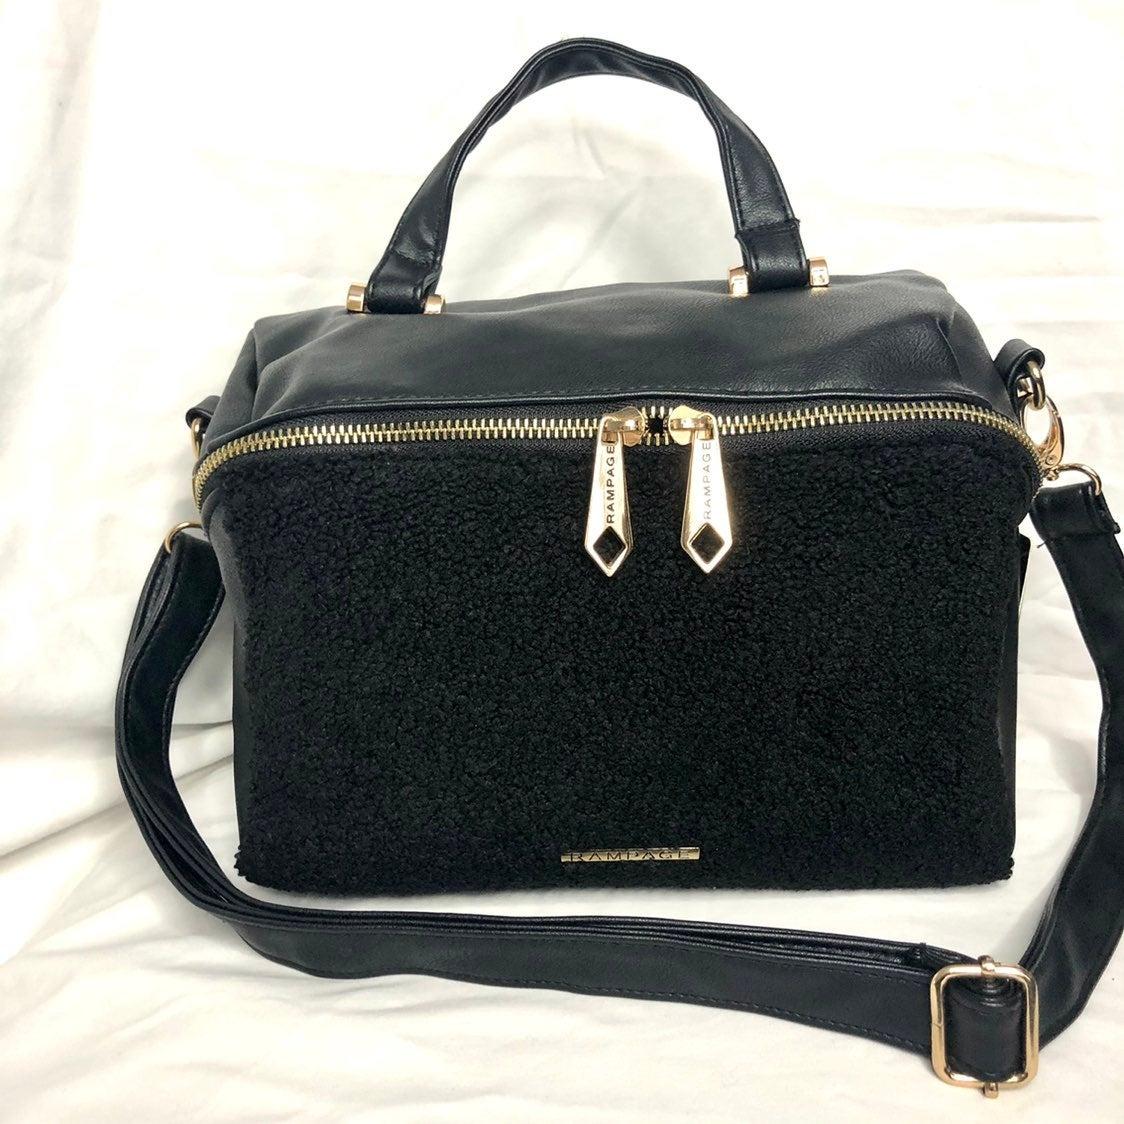 NWT Rampage black crossbody/handbag